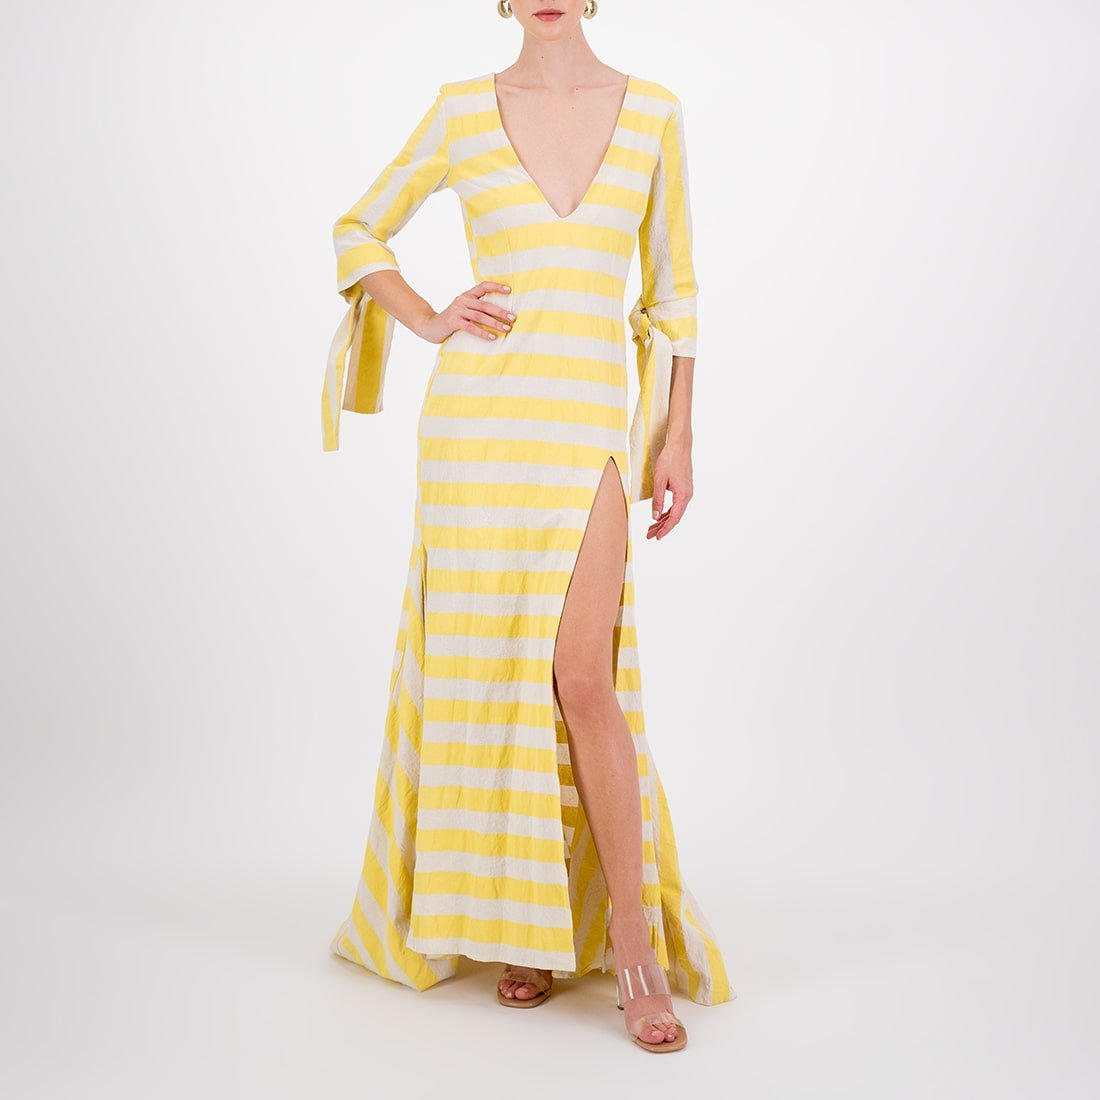 100% cotton floor-length, v-neck gown 2